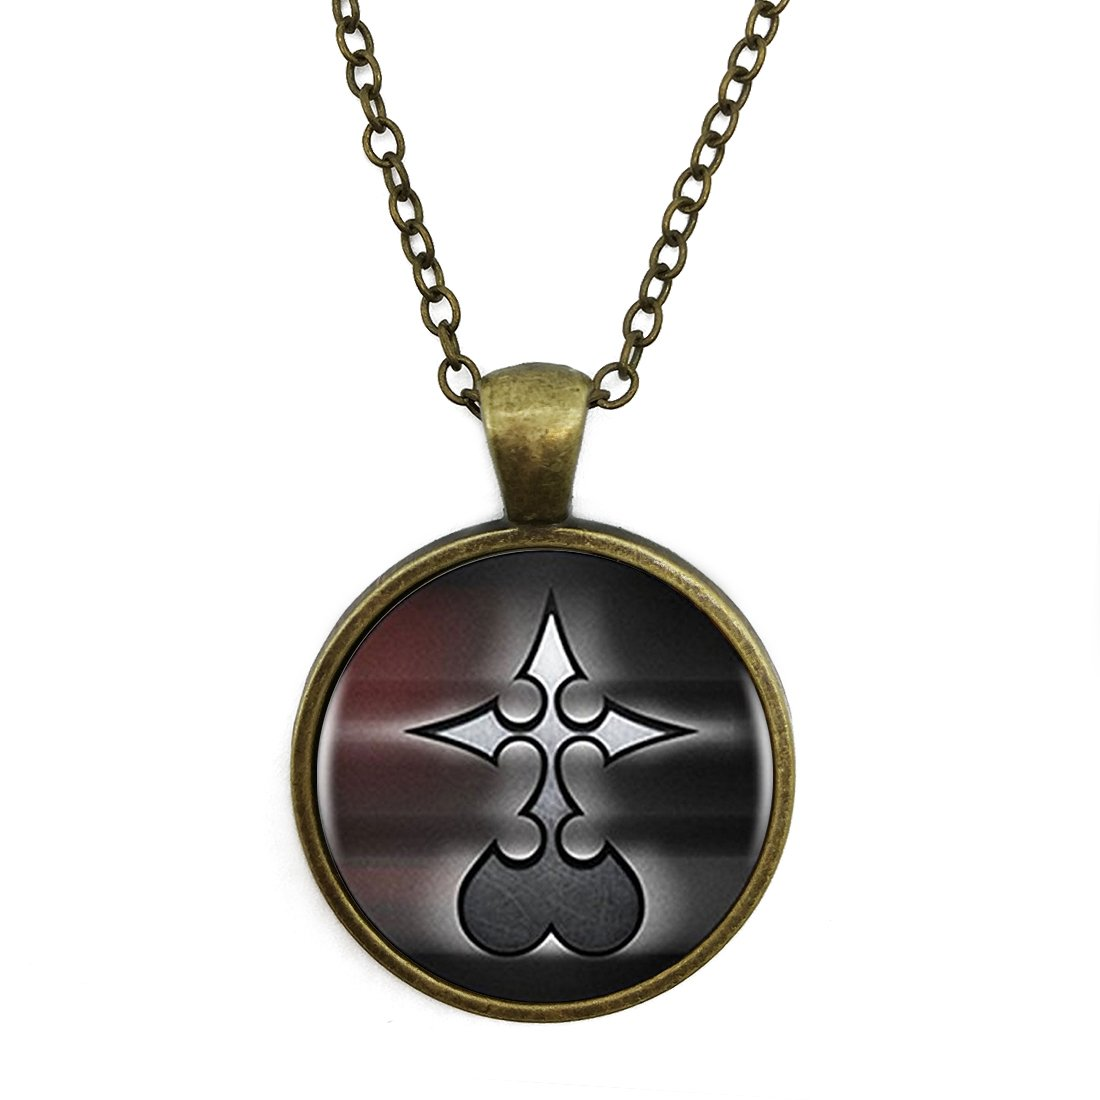 Amazon Mysterious Time Gem Pendant Chain Necklace Kingdom